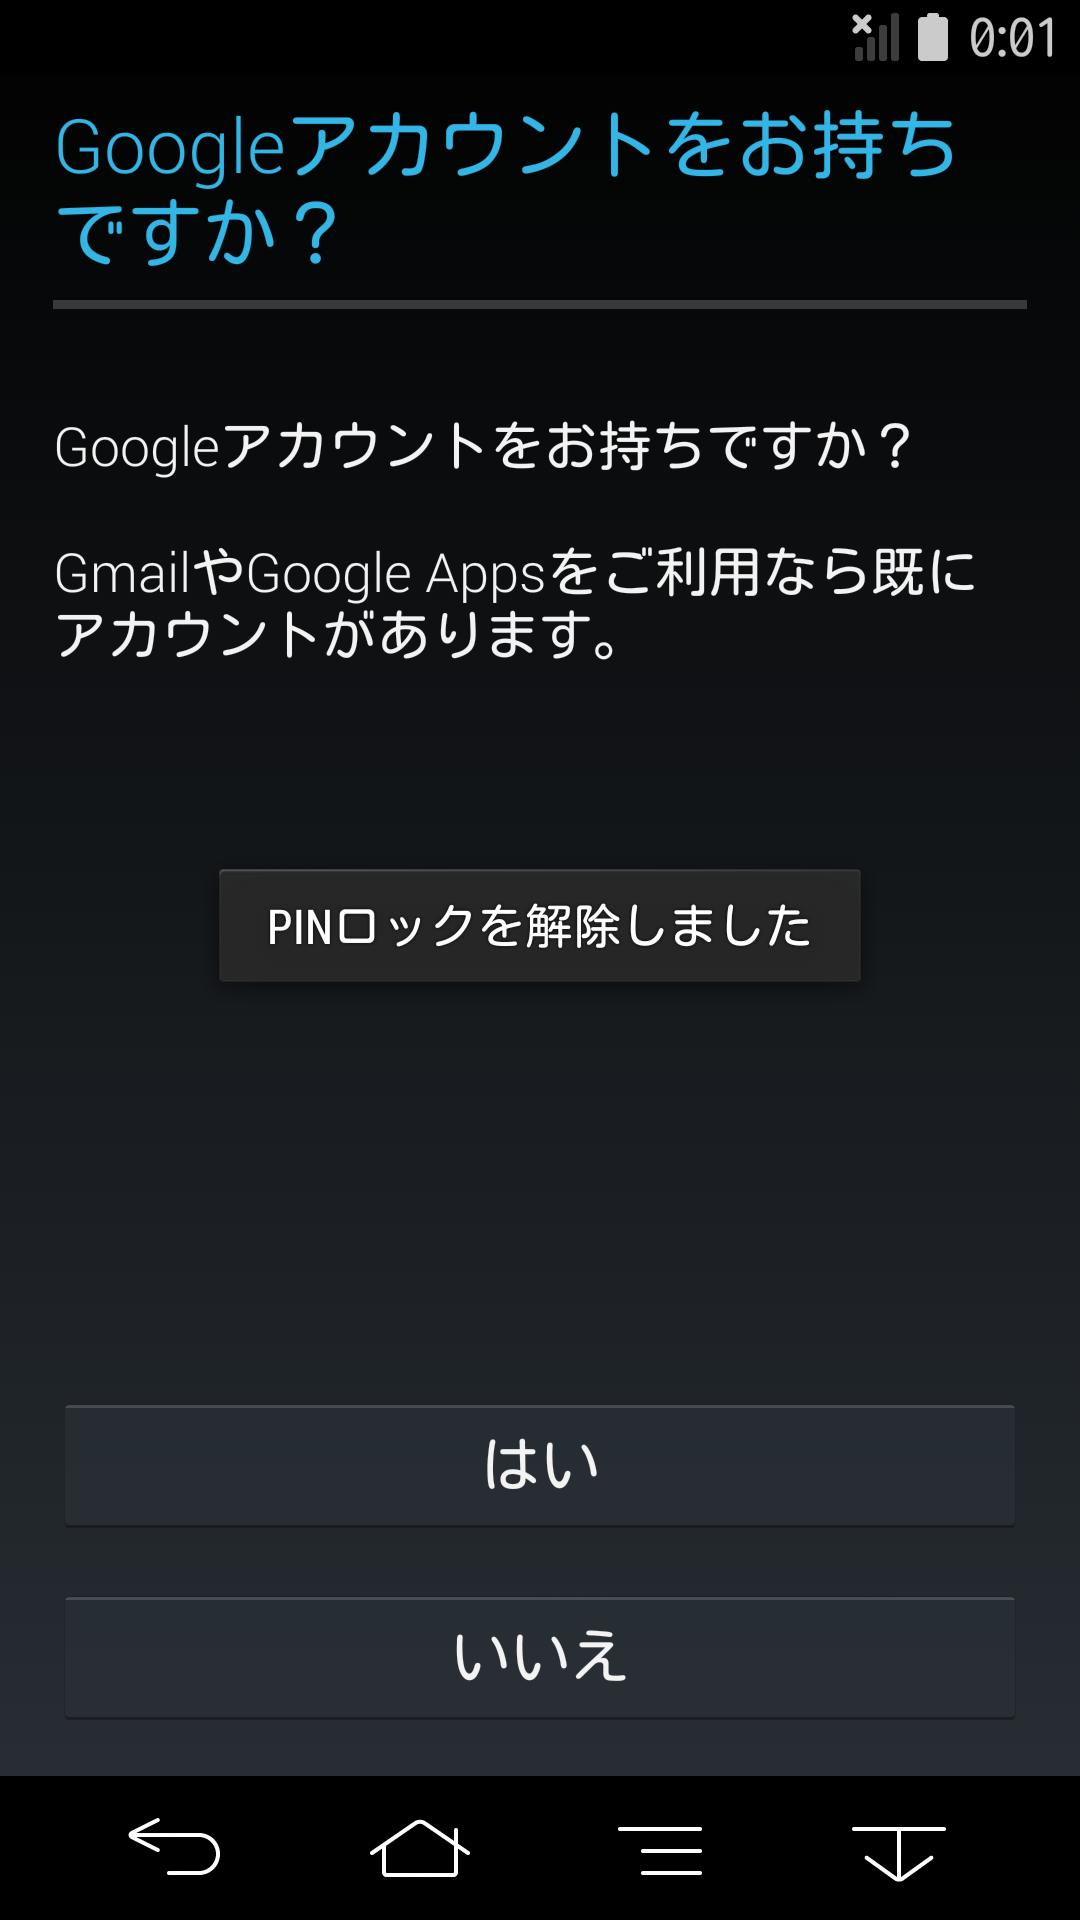 Screenshot_2014-01-01-00-02-01.png